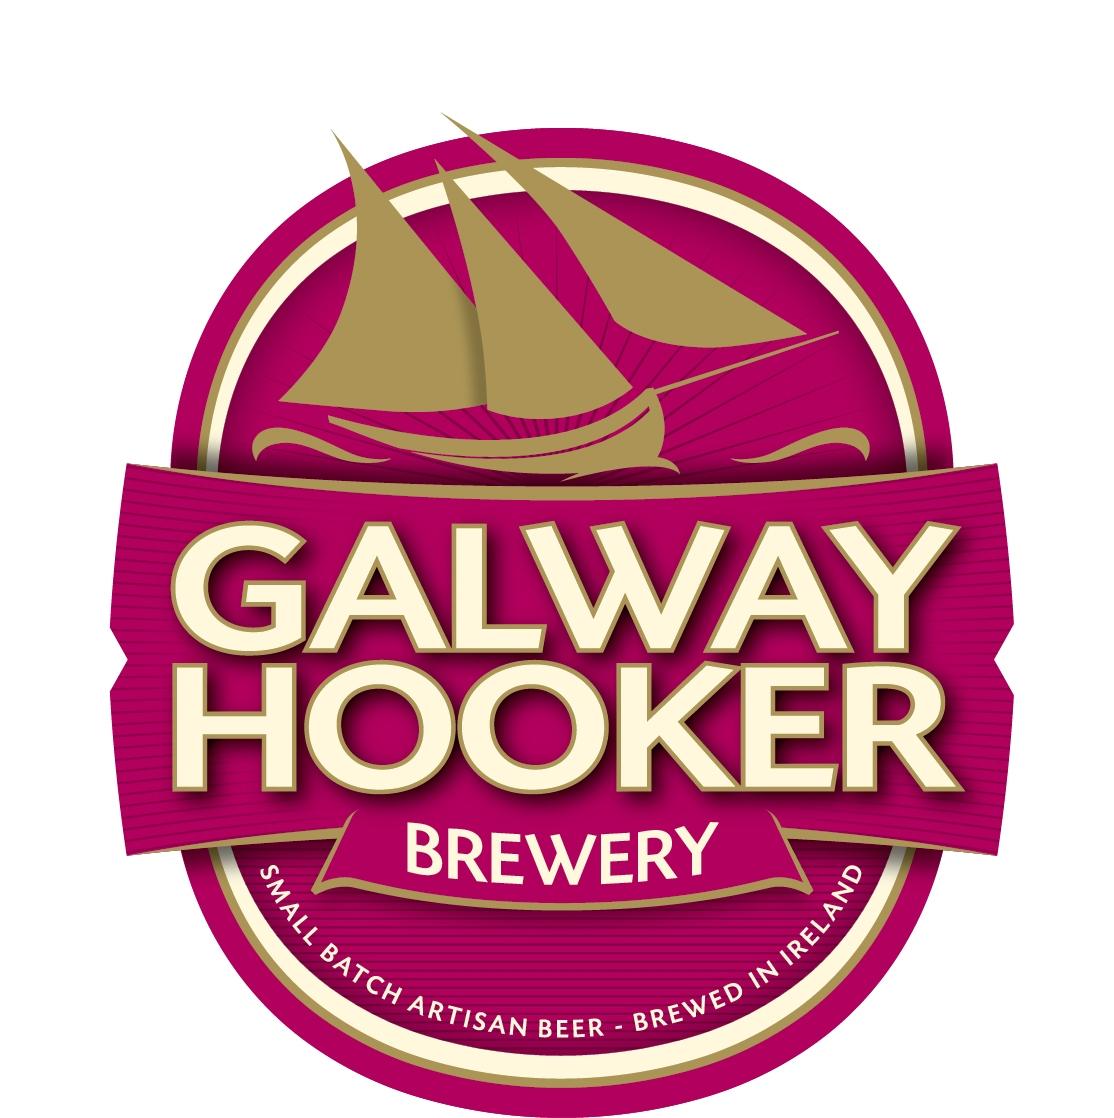 Galway Hooker